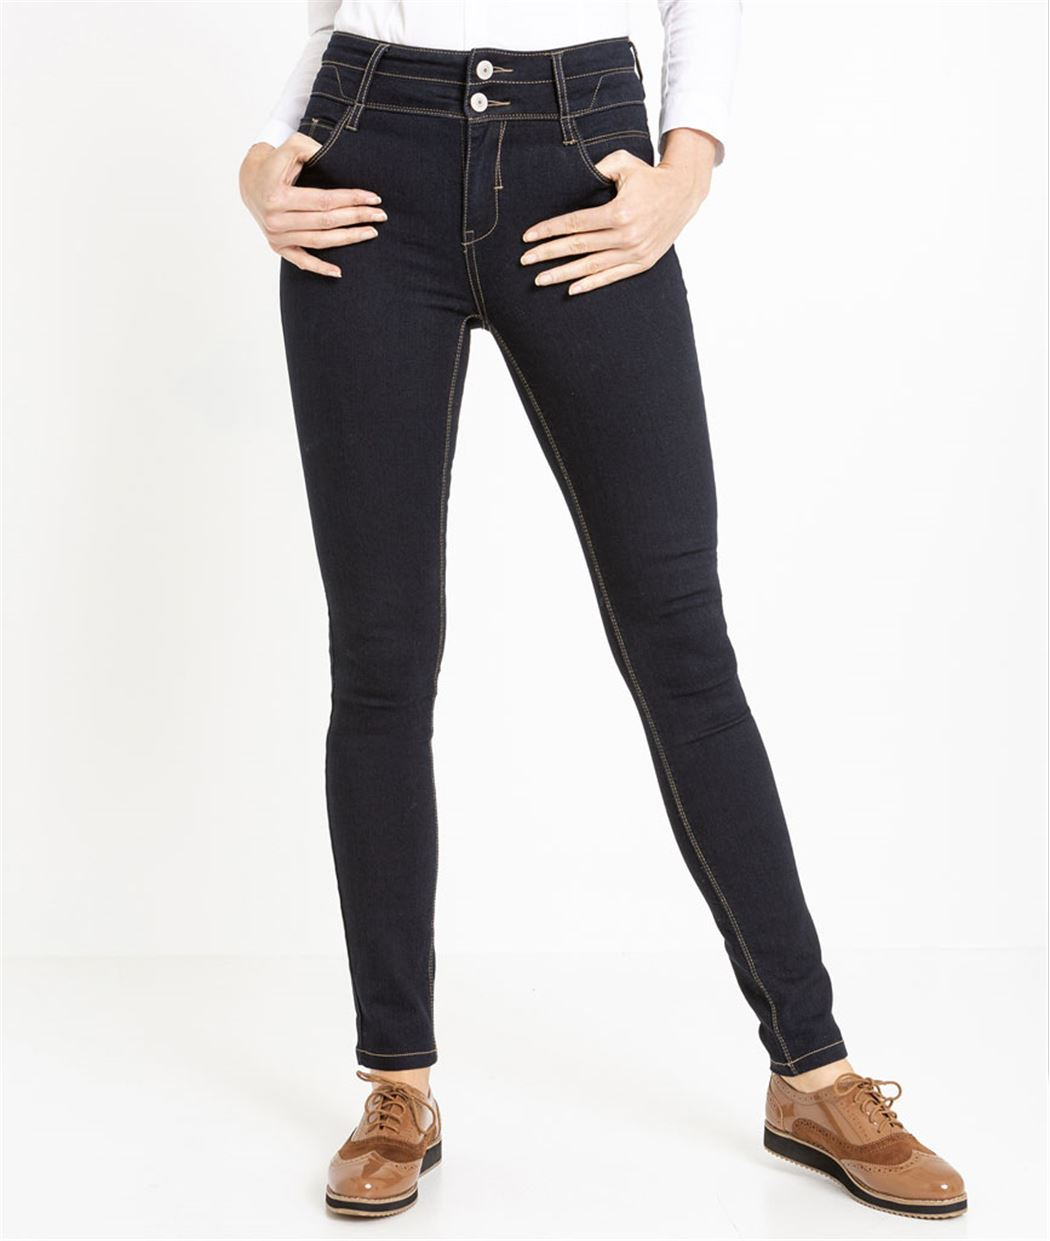 jean femme slim taille haute blue black grain de malice. Black Bedroom Furniture Sets. Home Design Ideas